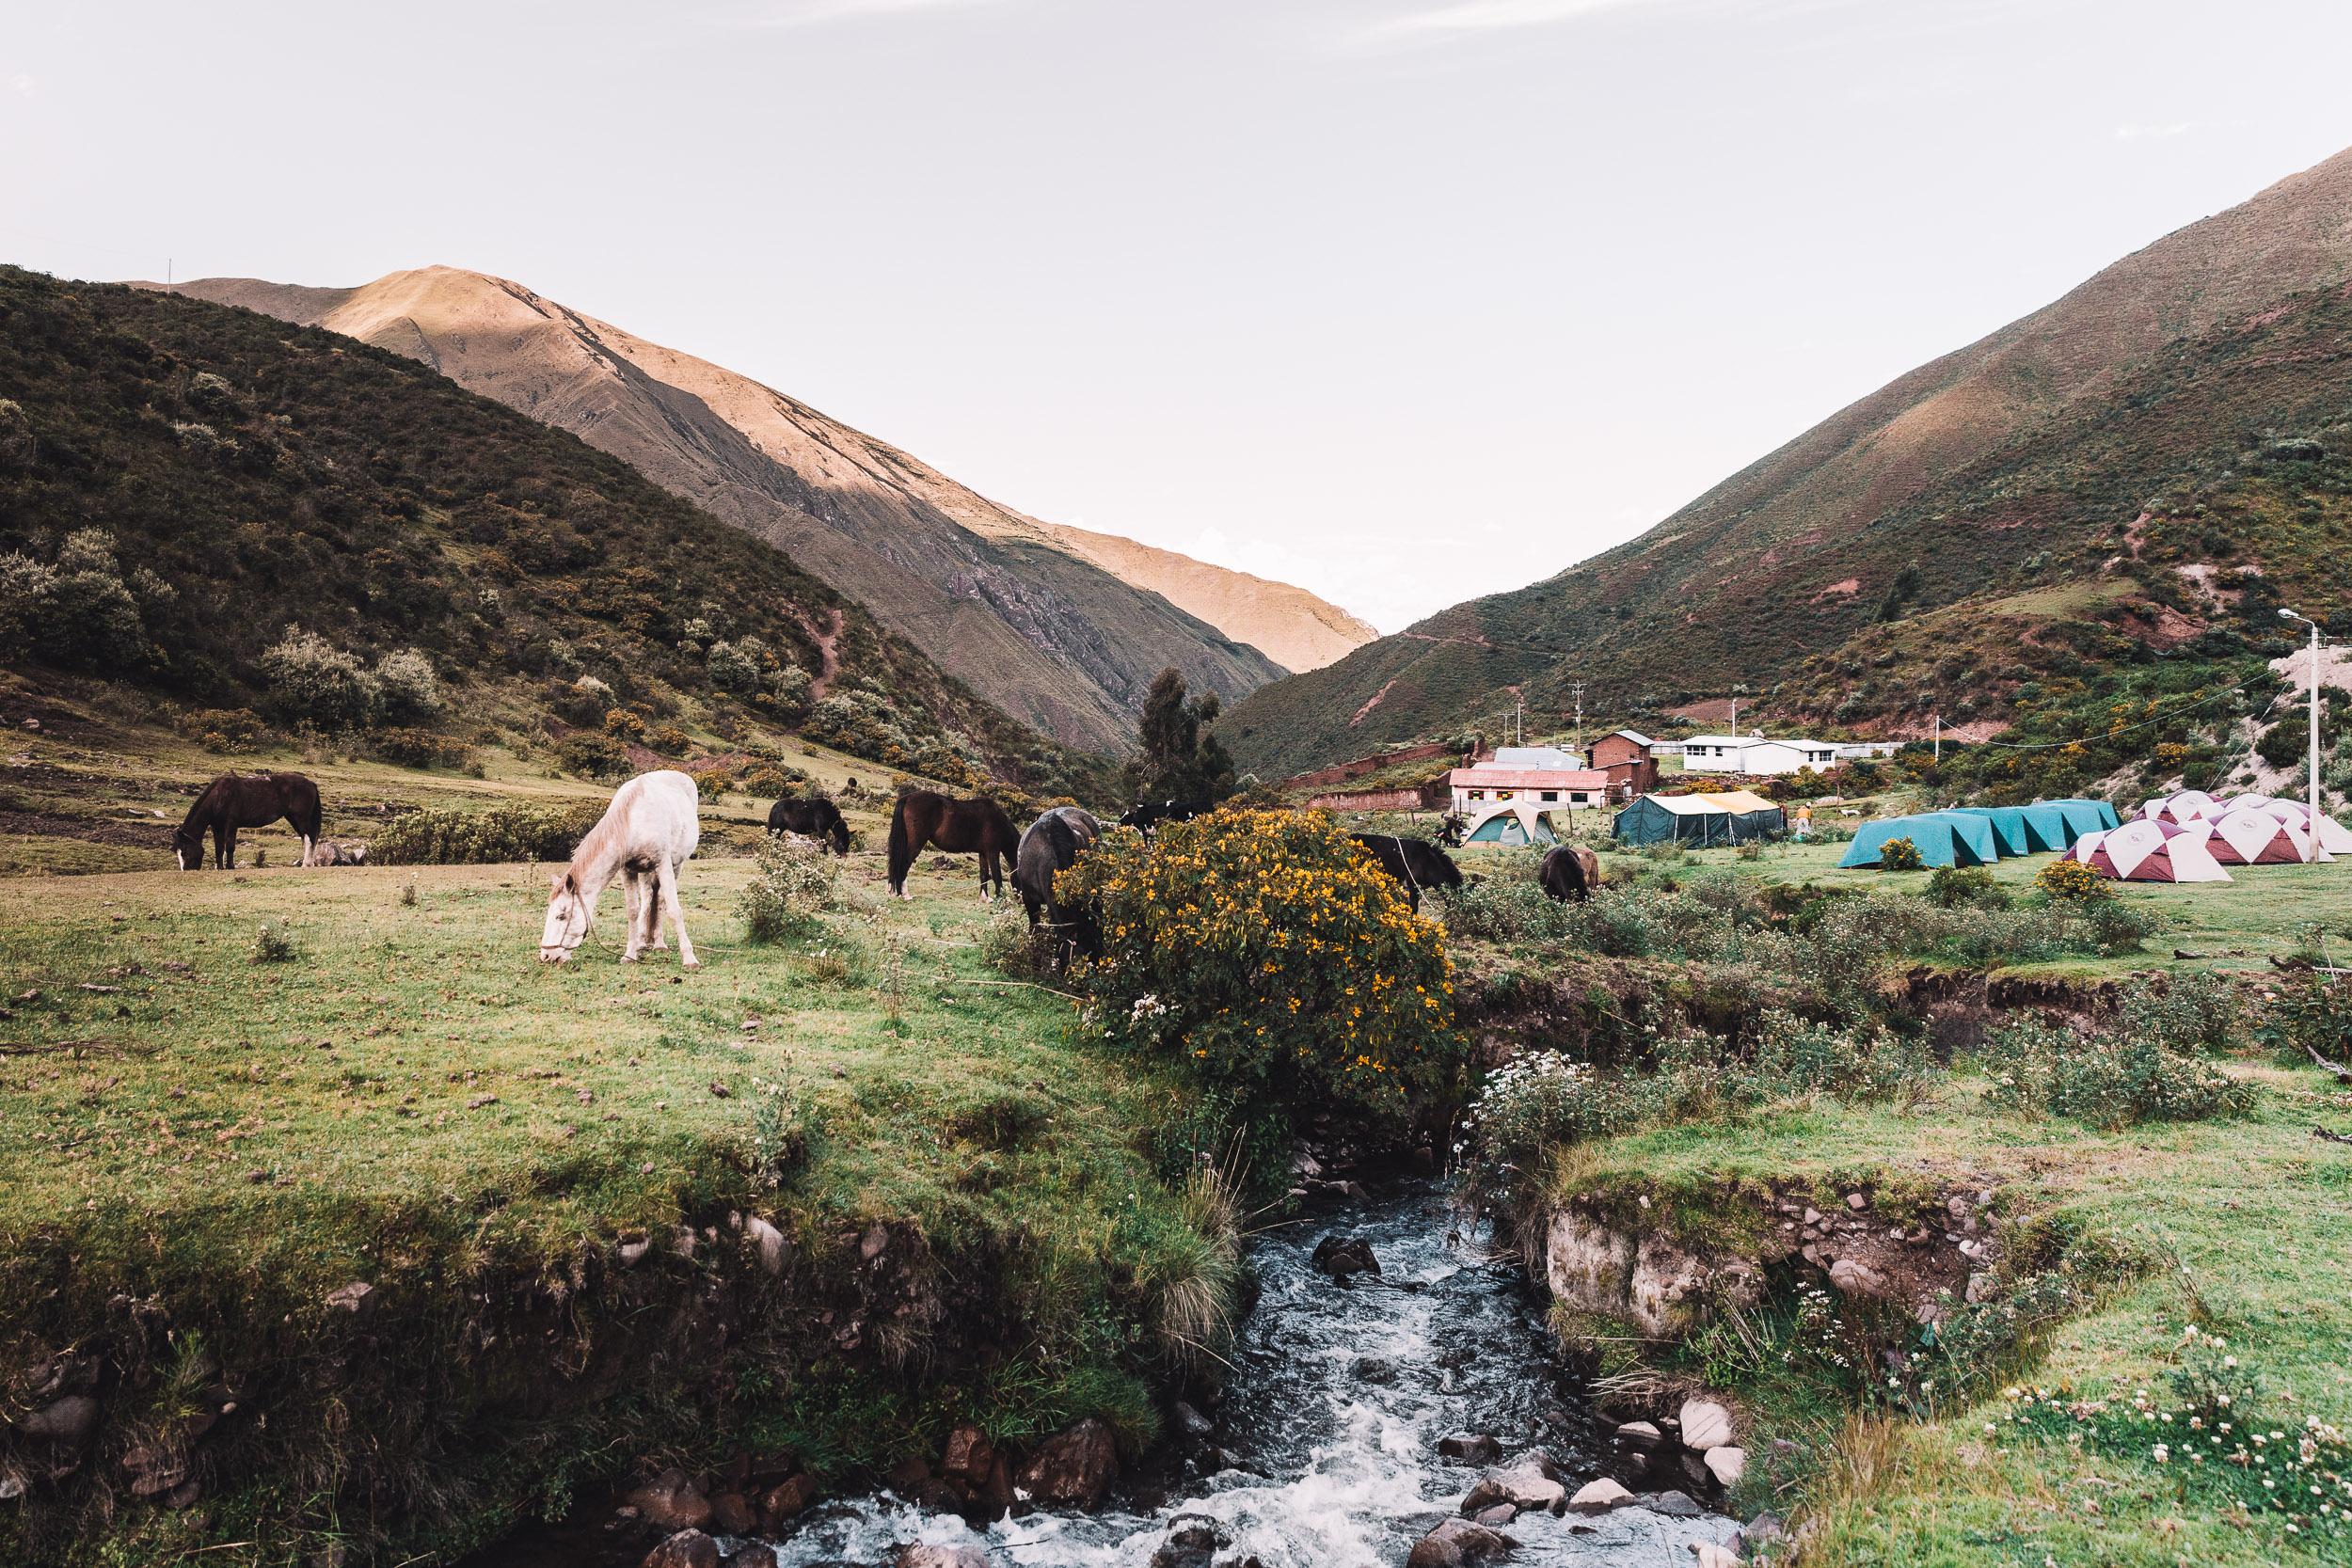 Campsite at Chilipagua on Trek to Machu Pichhu